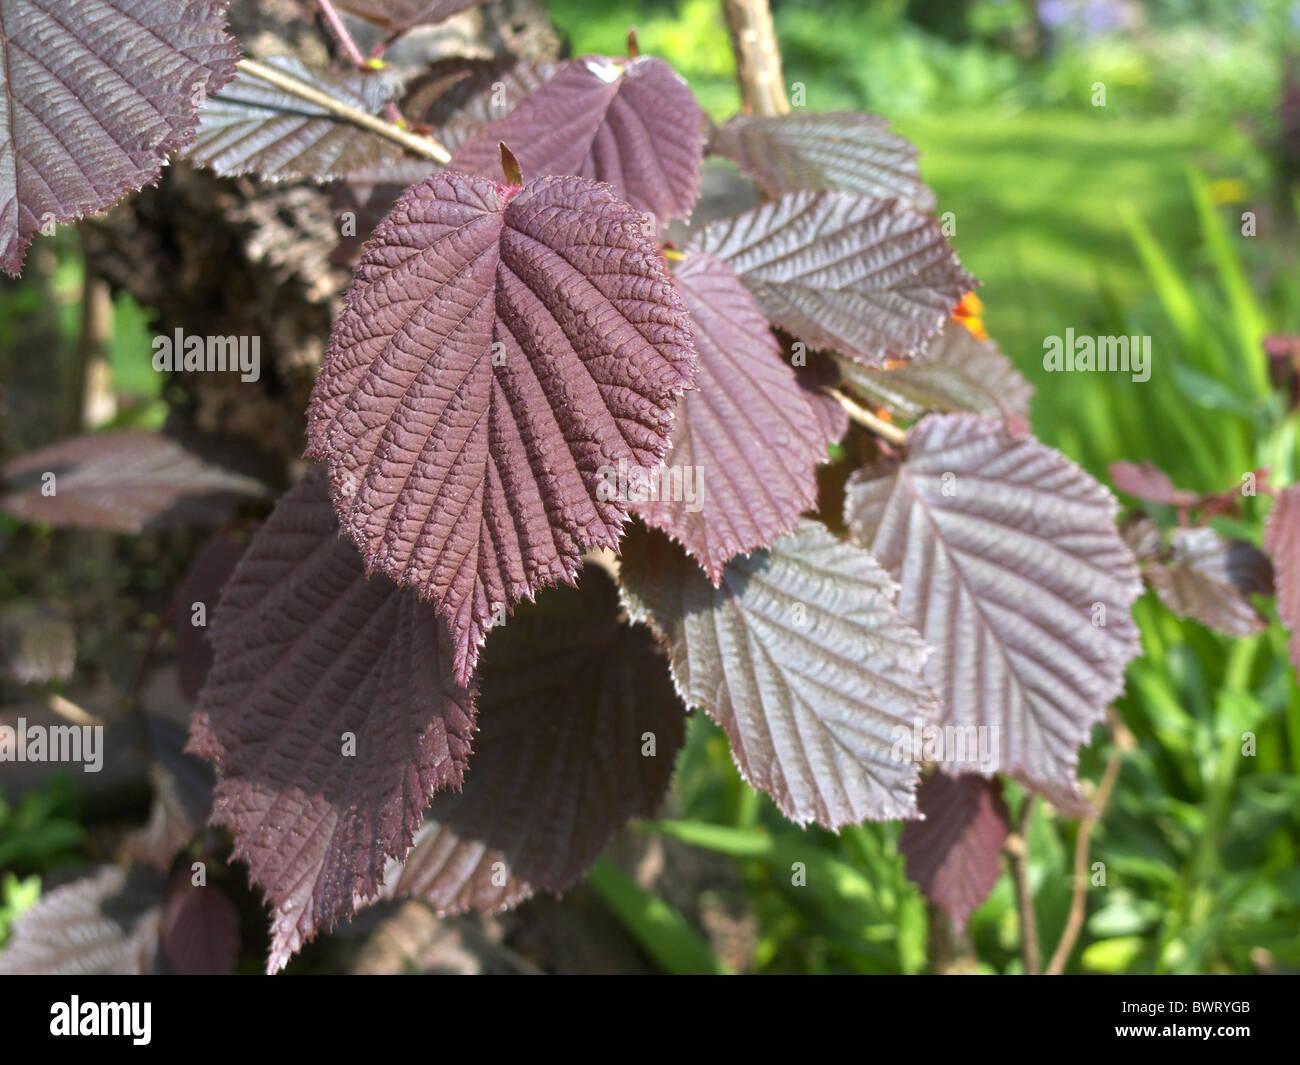 Corylus maxima 'Purpurea' Cultivar. Hazel Tree Family Stock Photo